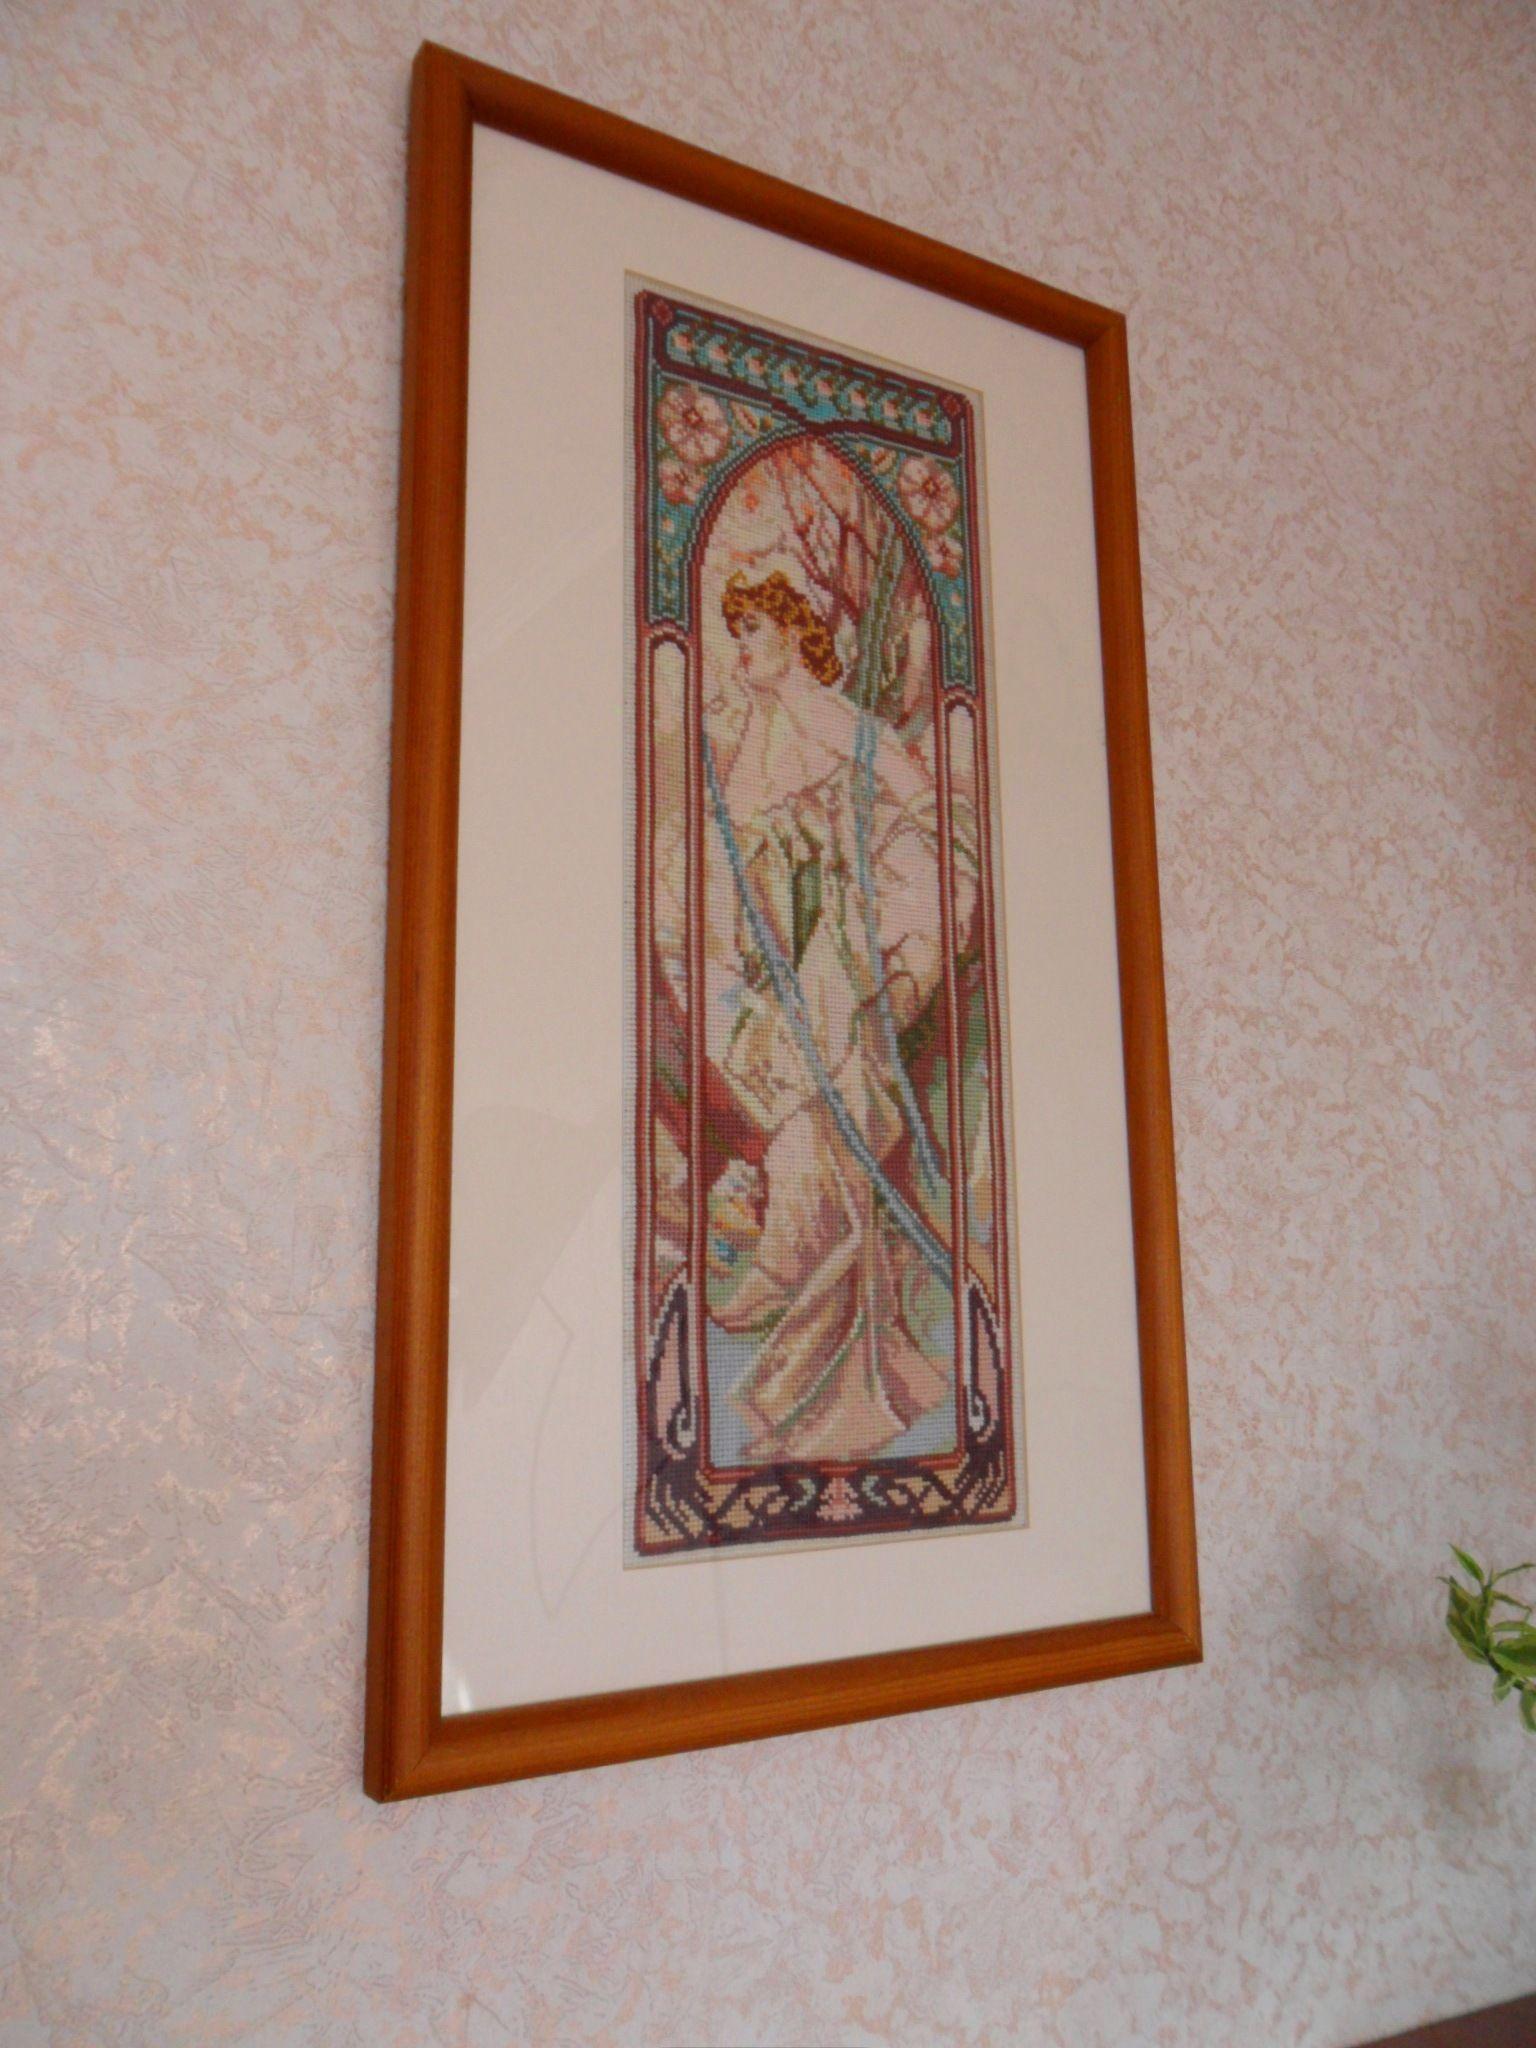 "Cross Stitch by Yaroslava Shevchenko (Russia). Работа выполнена по картине Альфонса Мухи ""Вечерние грёзы""."